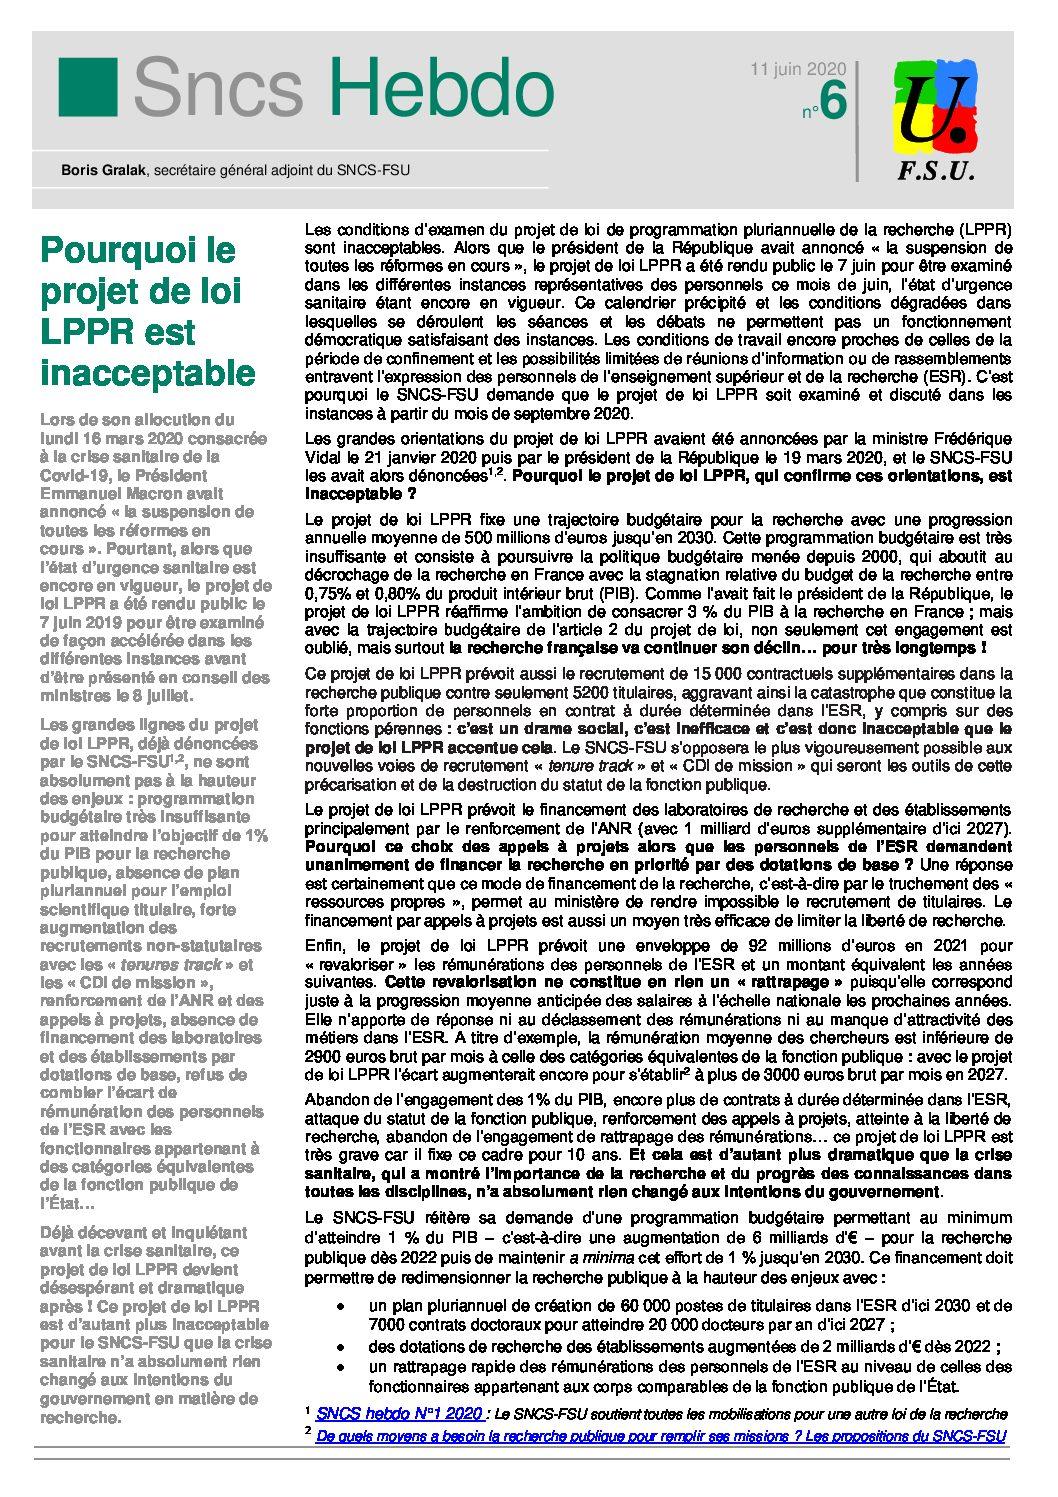 SNCSHEBDO20N°6-1-pdf.jpg